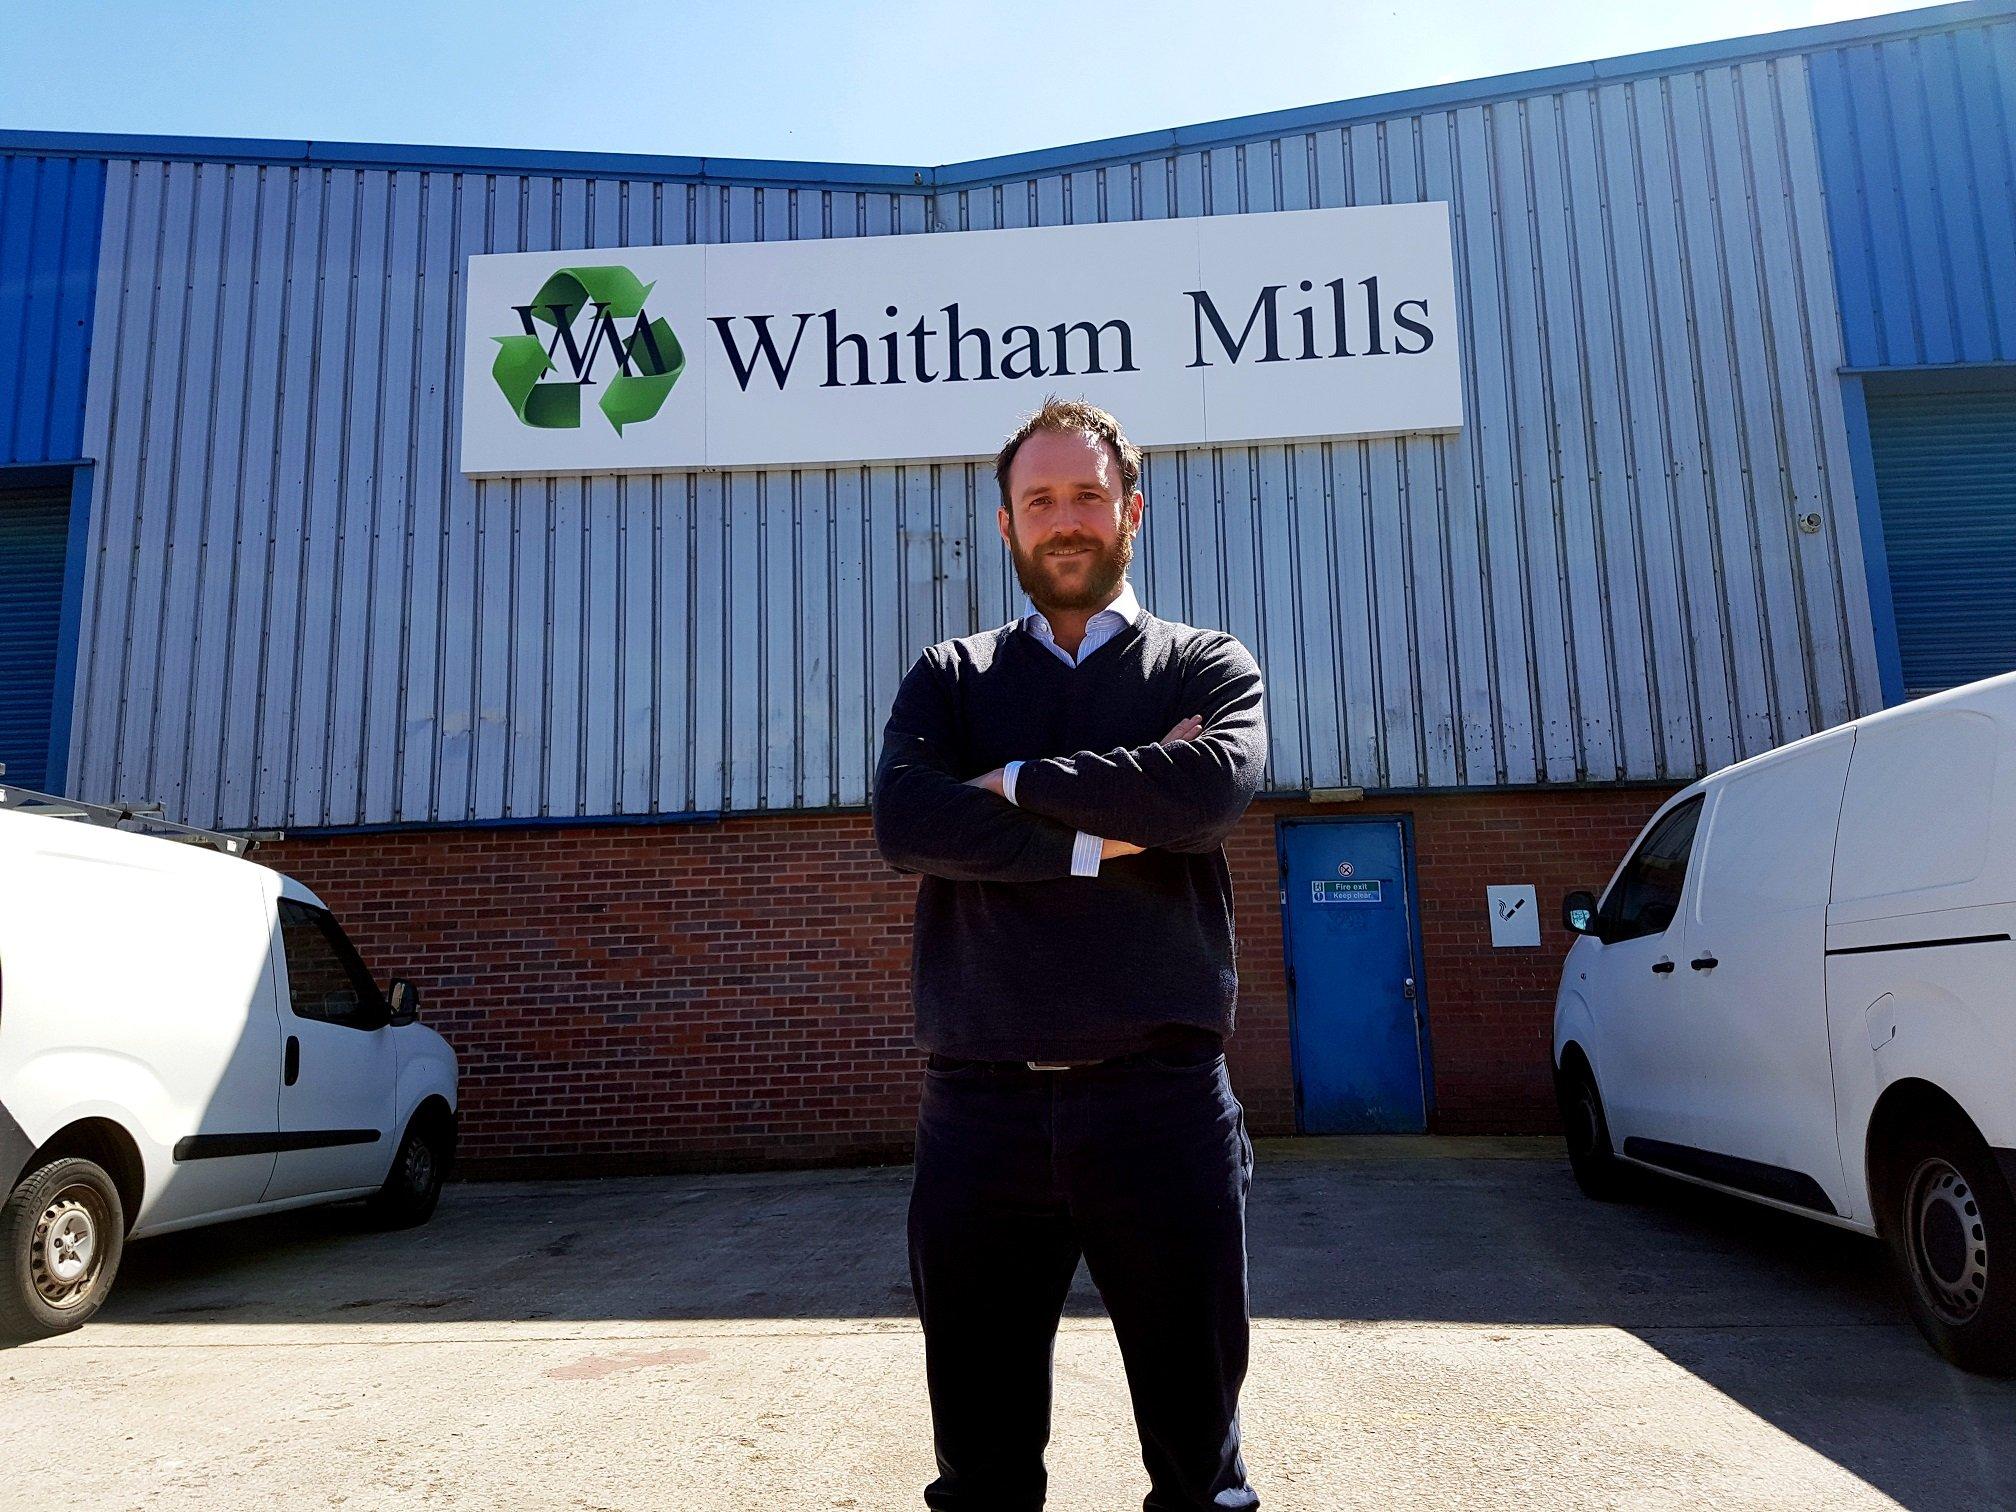 Whitham Mills